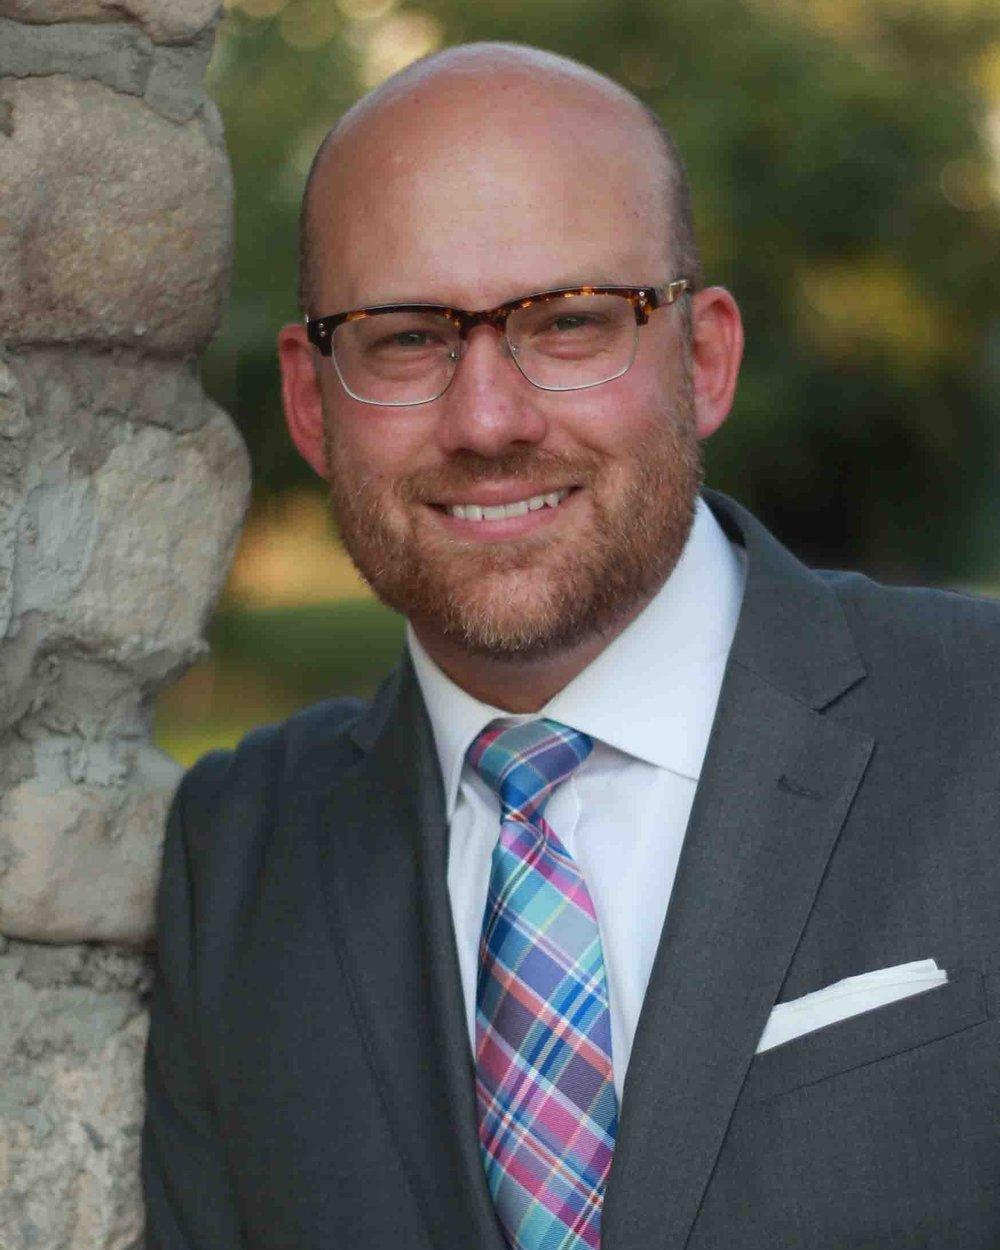 Mason Heywood, md  Family Medicine Resident